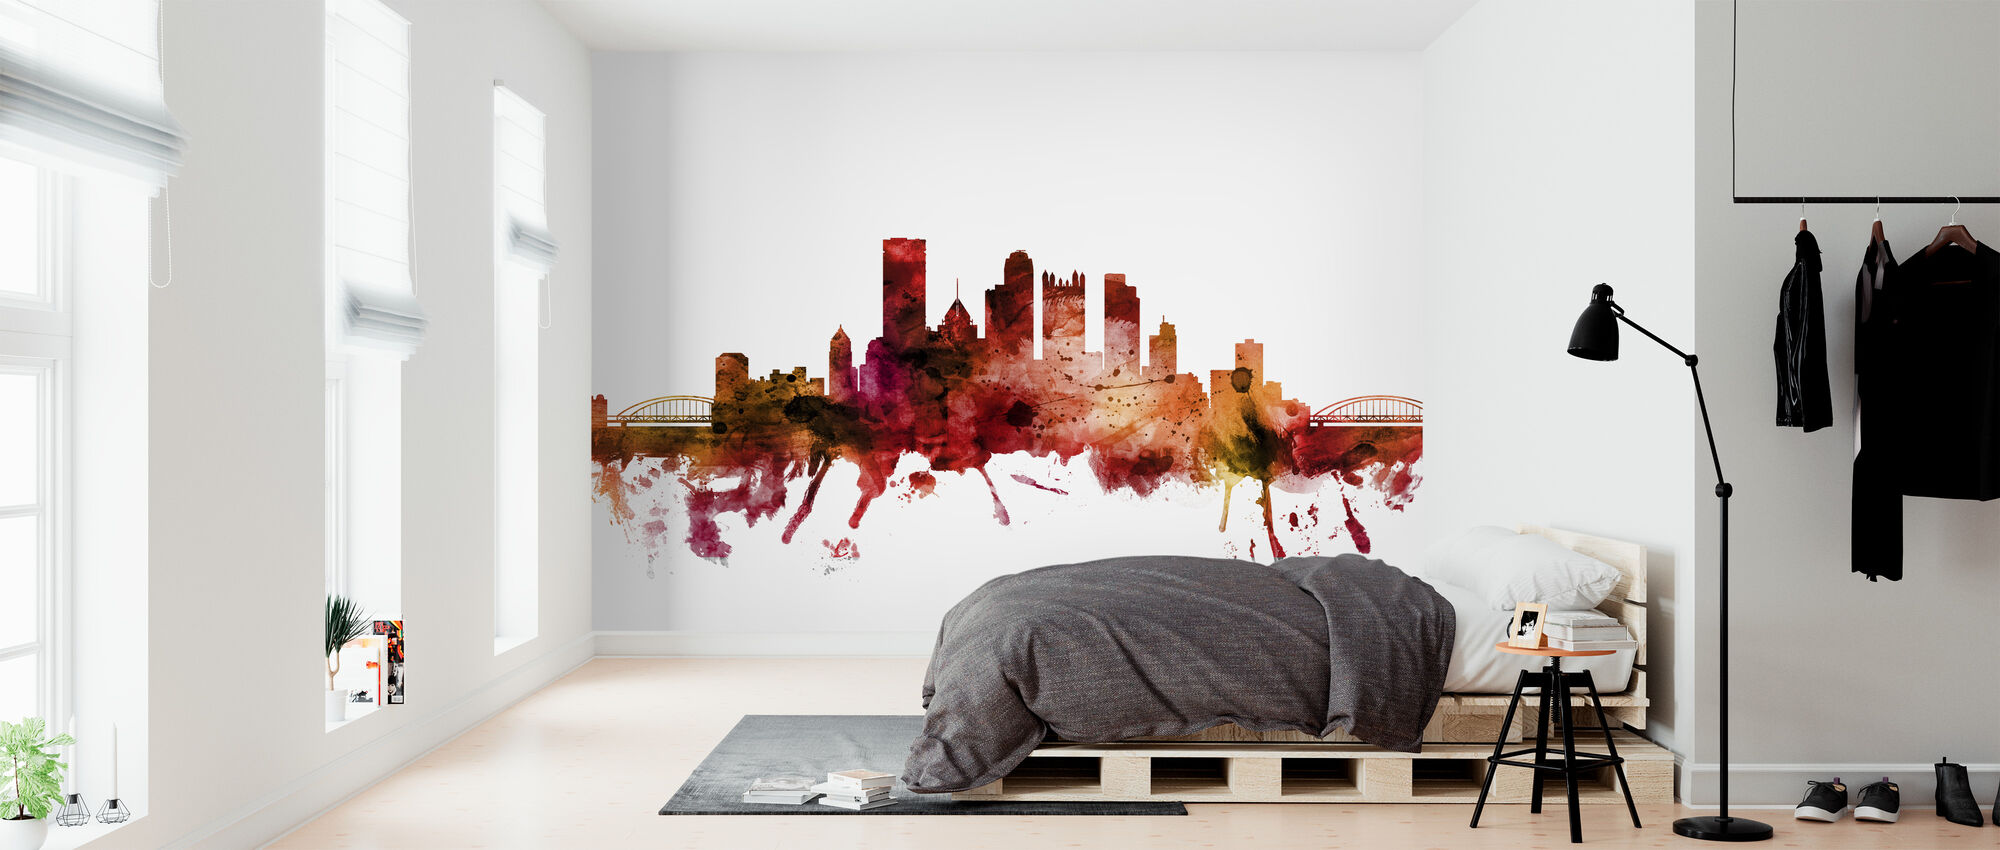 Pittsburgh Pennsylvania Skyline - Wallpaper - Bedroom